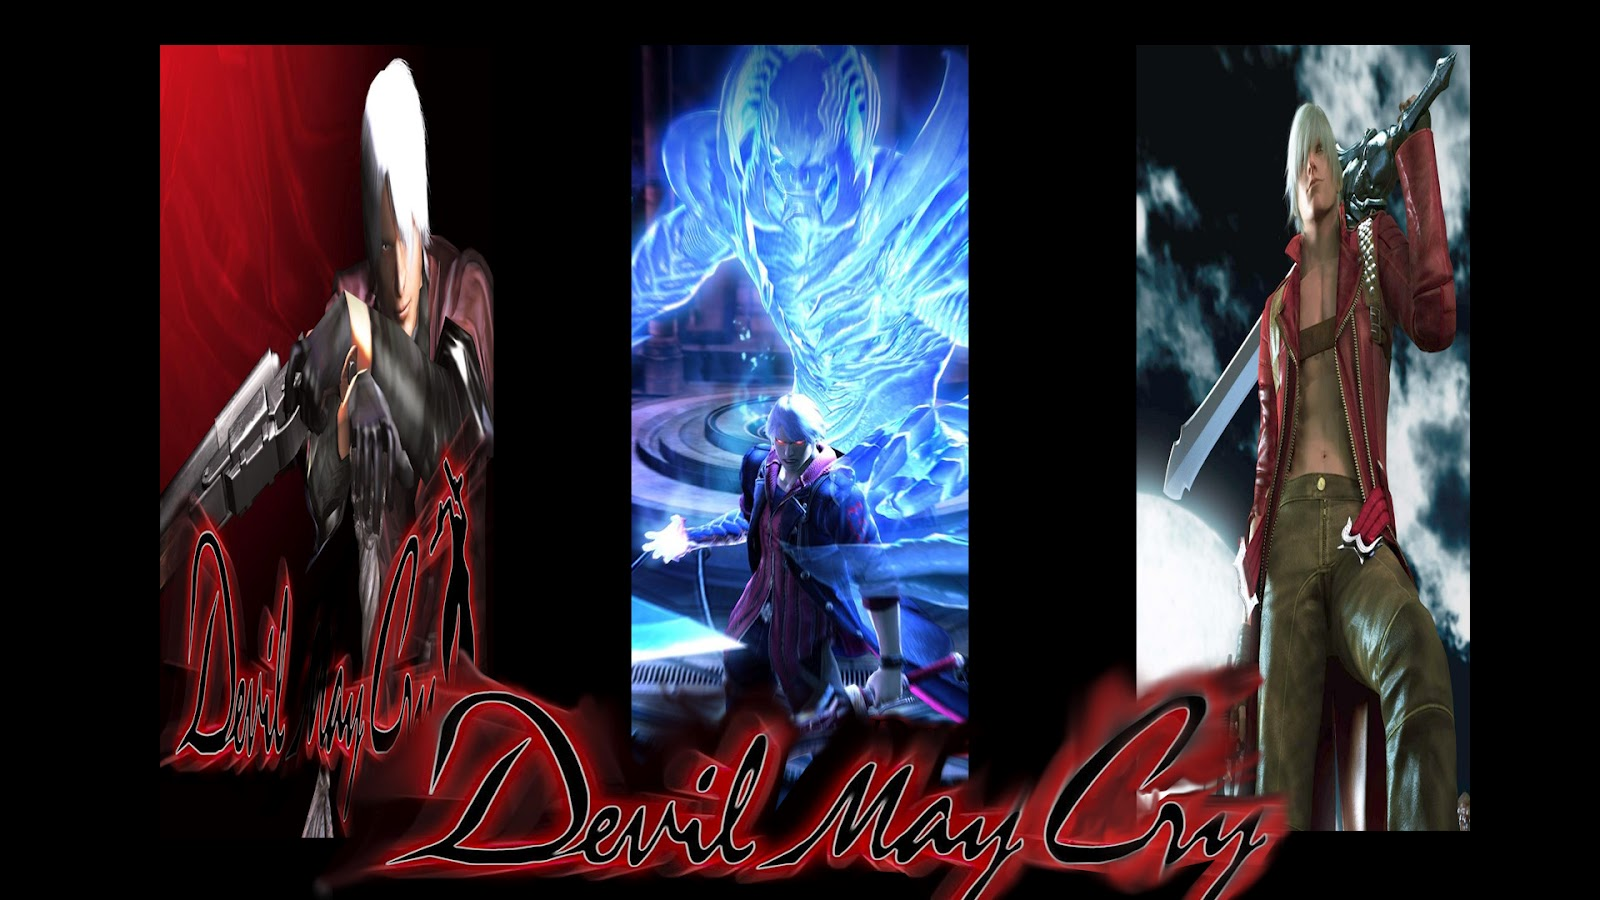 http://4.bp.blogspot.com/-qmg3Z9HQpsY/UBXjGNiYEOI/AAAAAAAAGBc/zBmEOyklRuc/s1600/devil_may_cry_by_jedai999.jpg